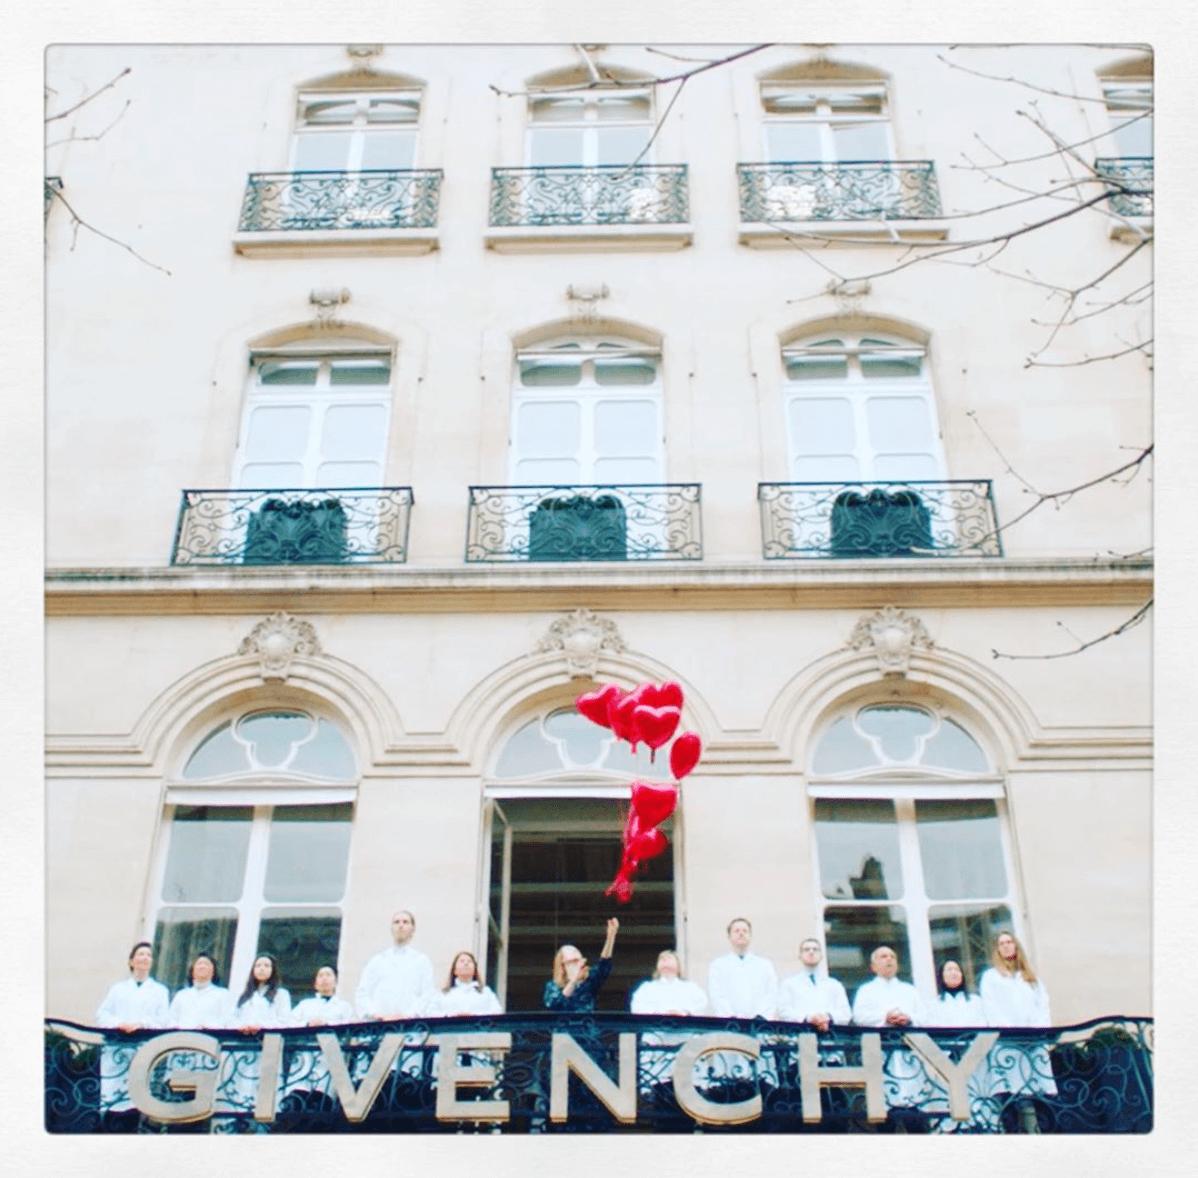 CONNEXION Fin de Collaboration entre Givenchy et Clare Waight Keller